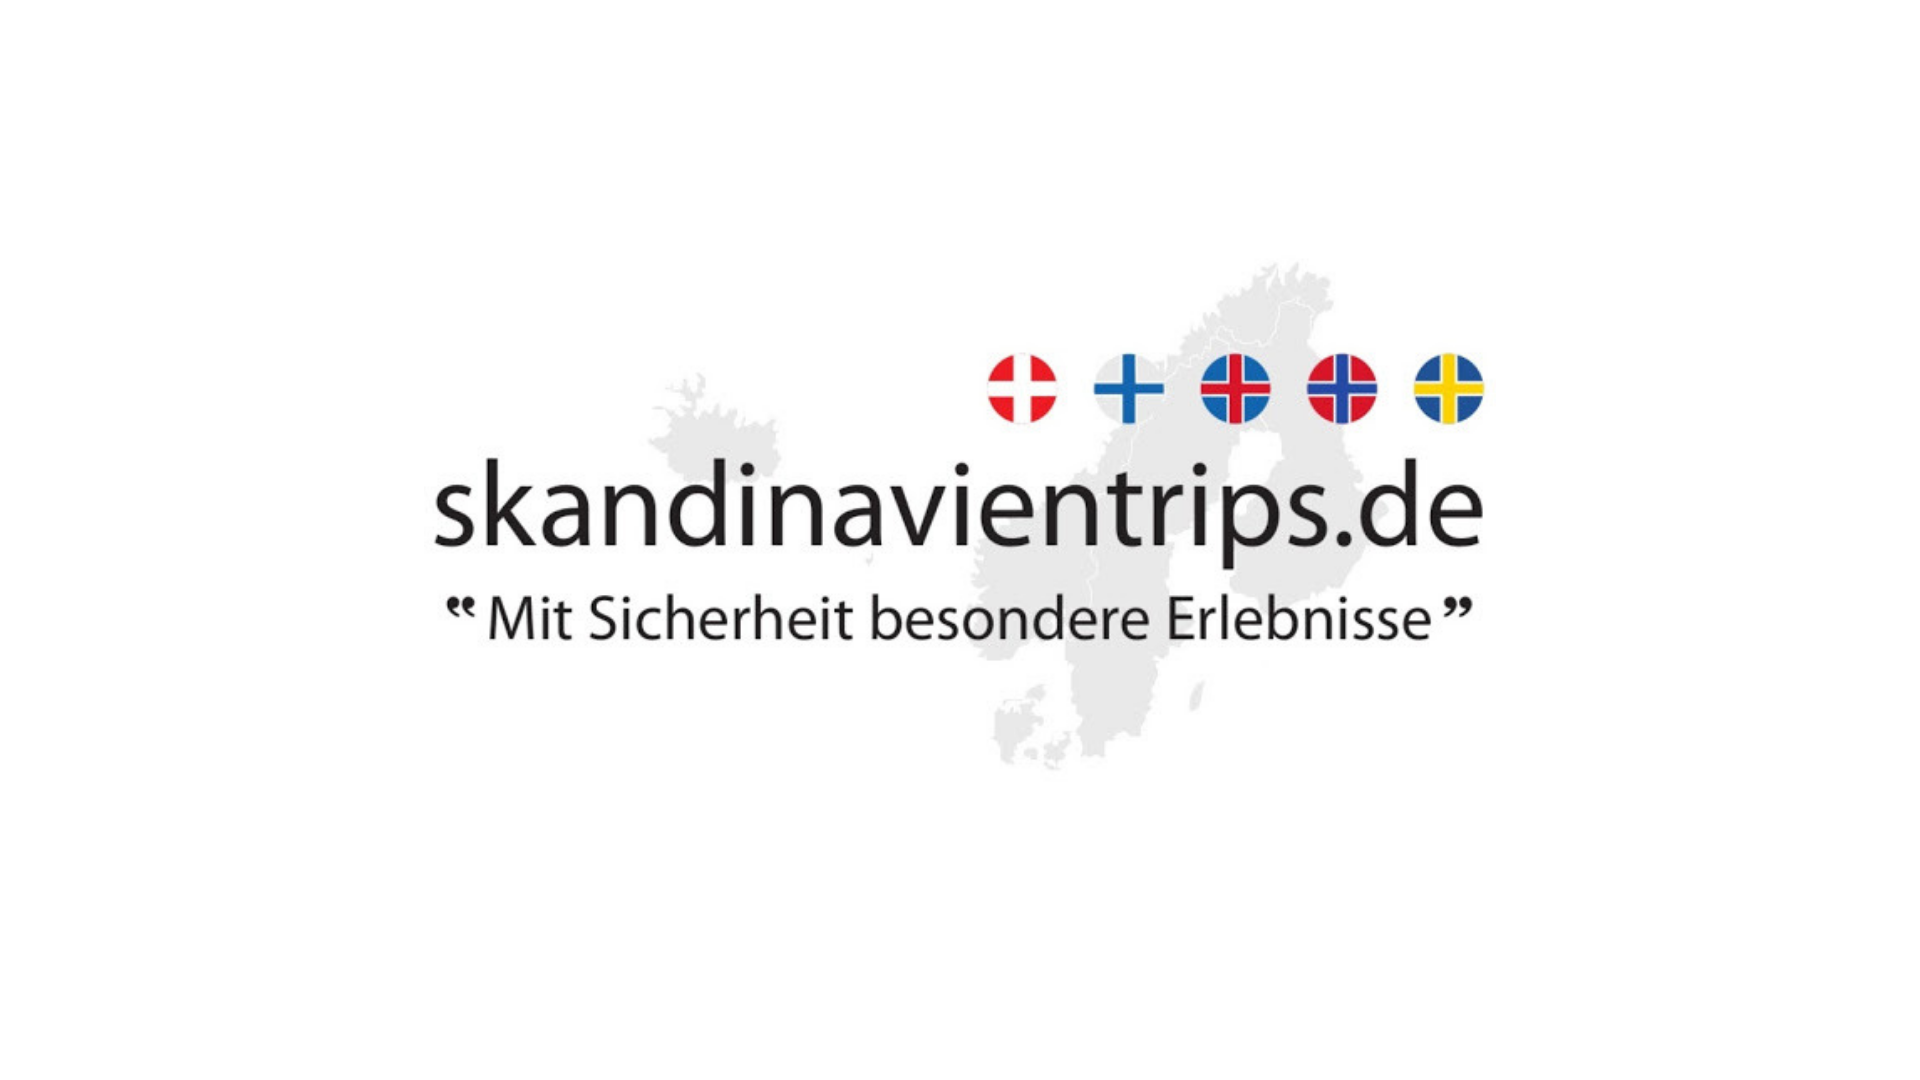 skandinavientrips-logo-w